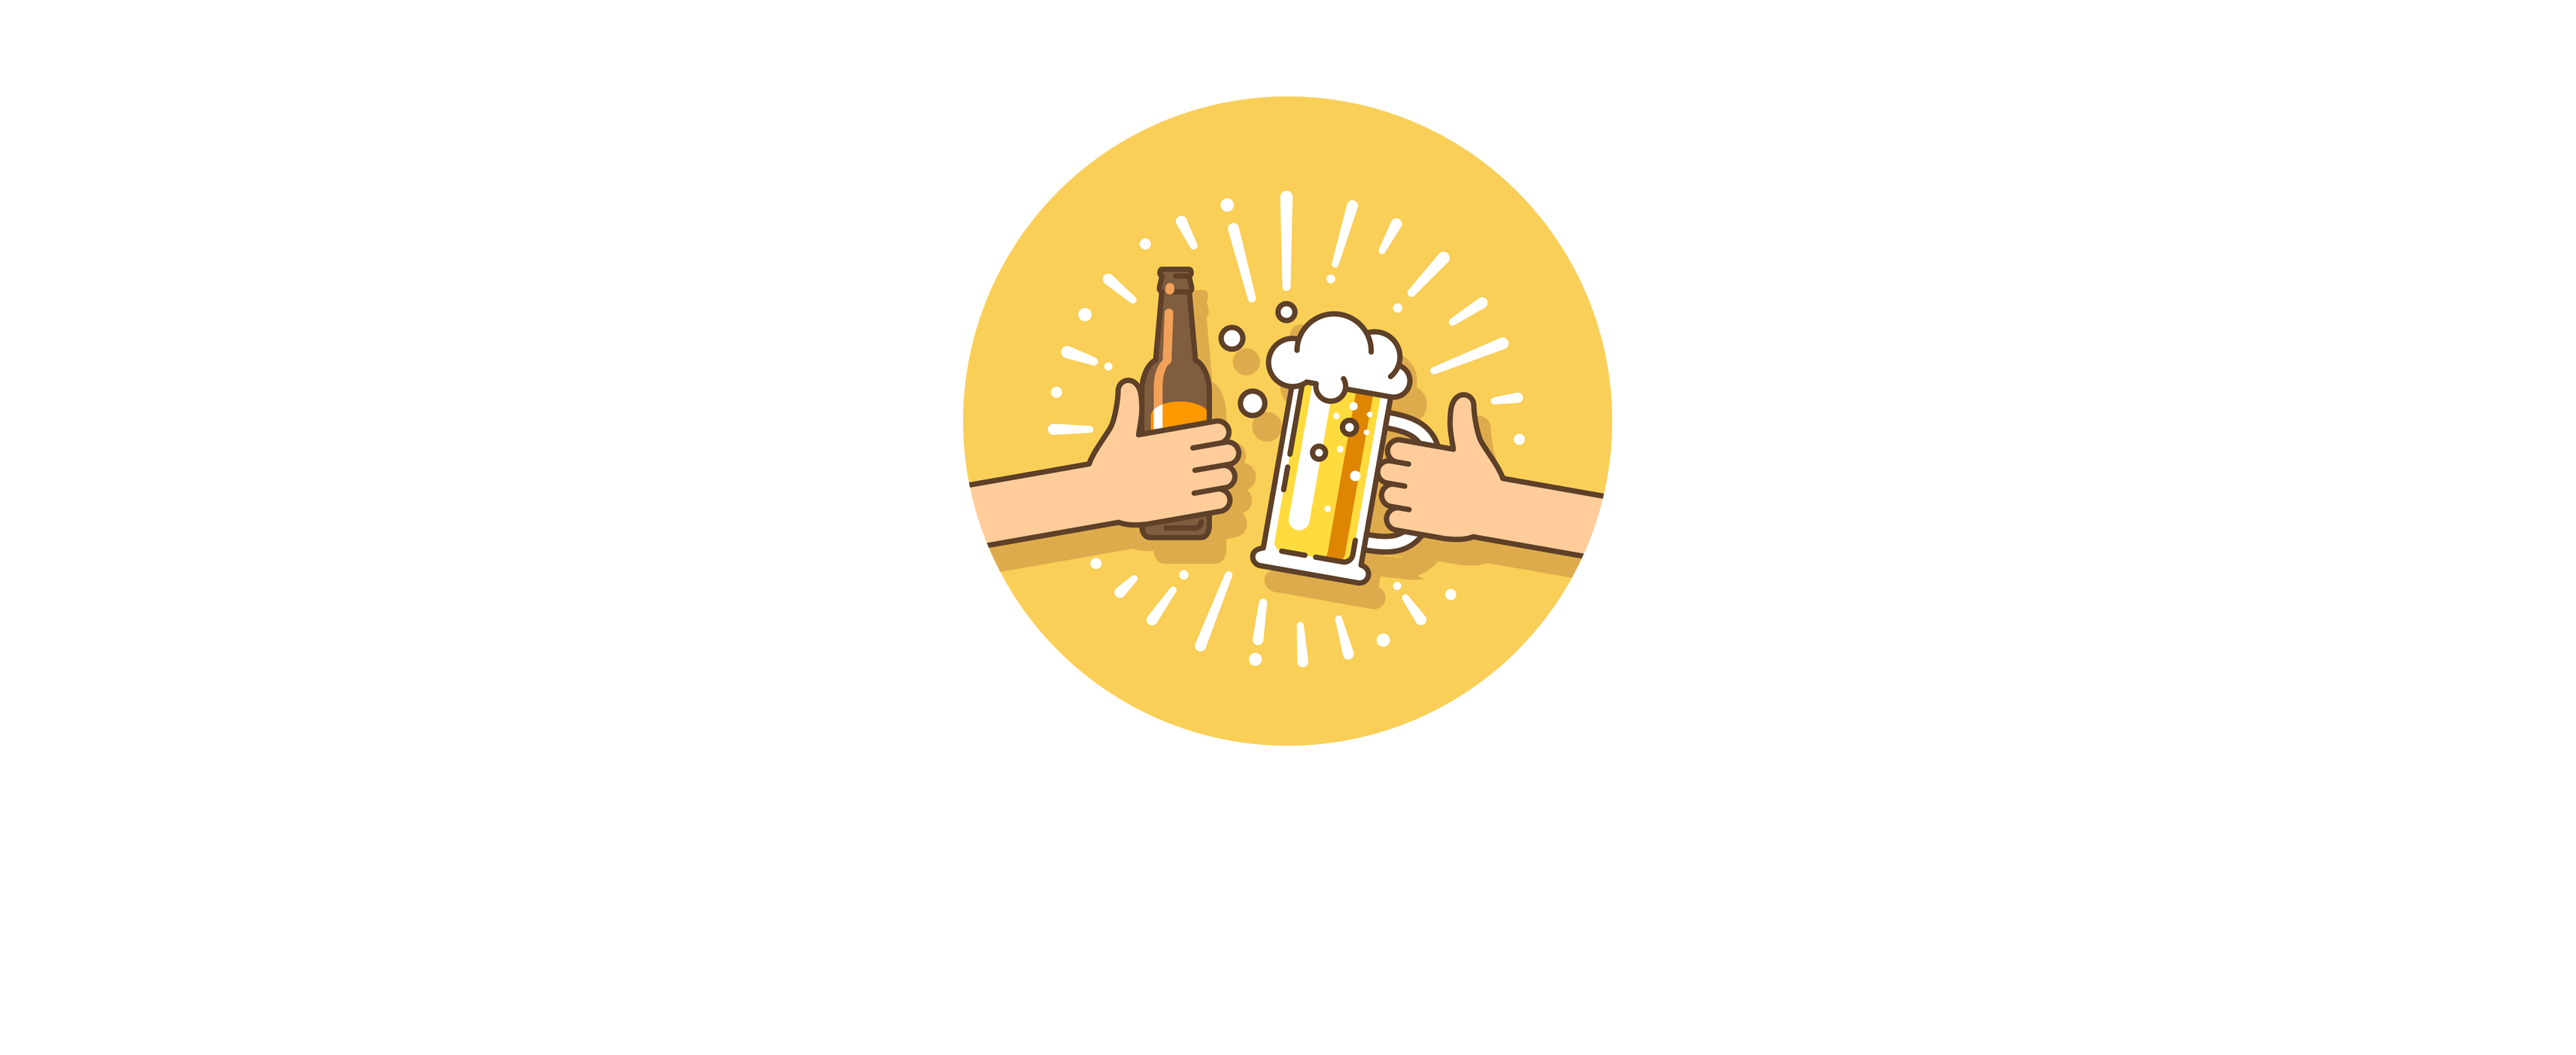 Vienna Nights Pub Crawl